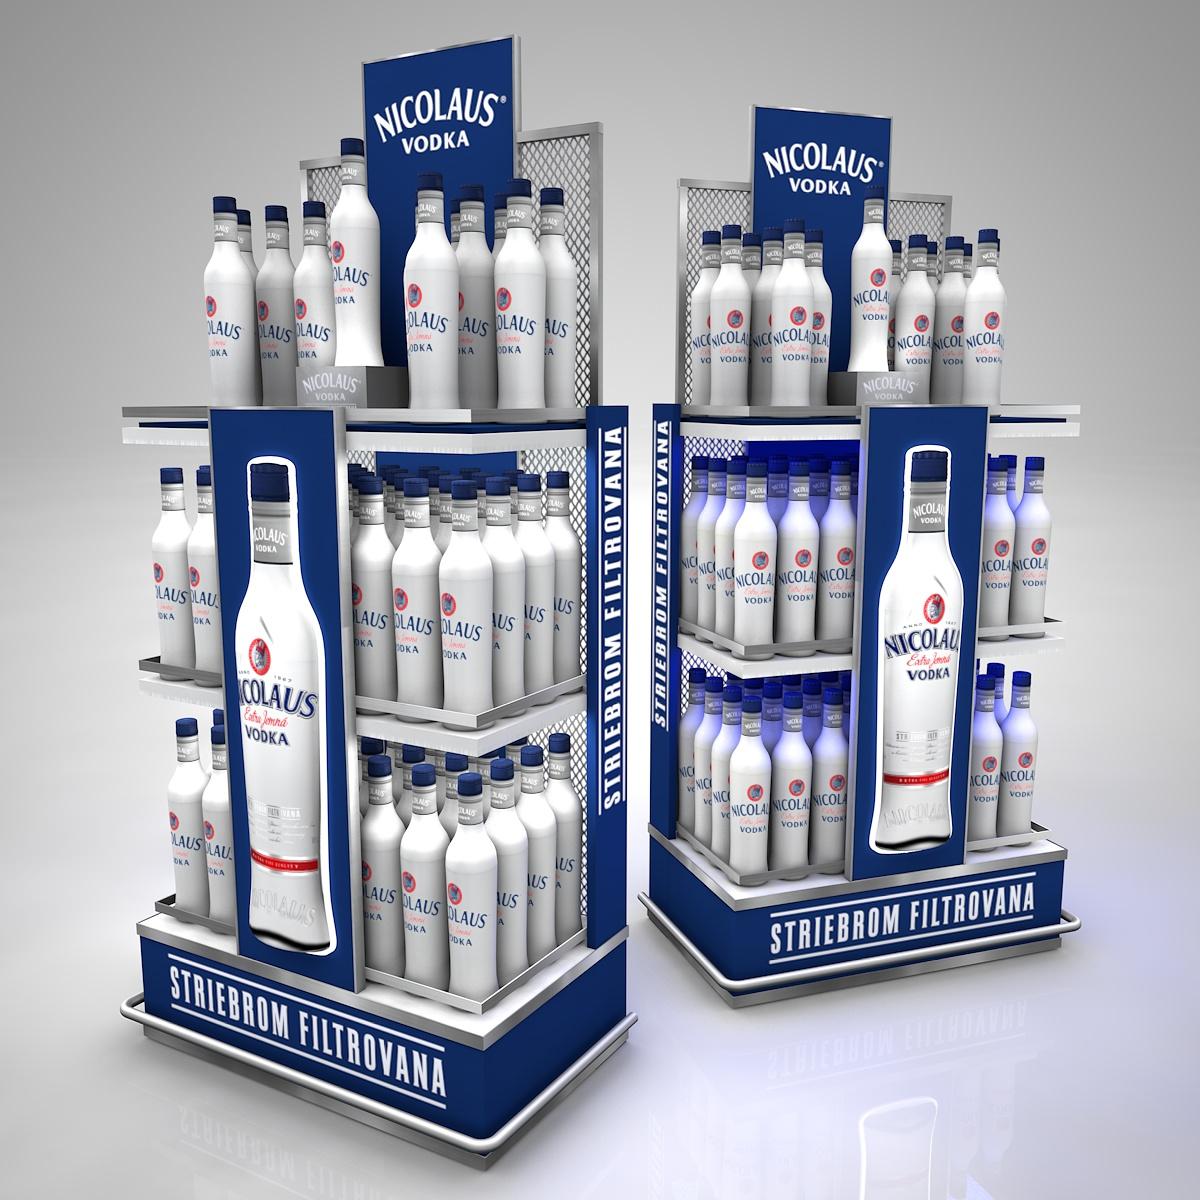 Nicolaus Vodka, regál